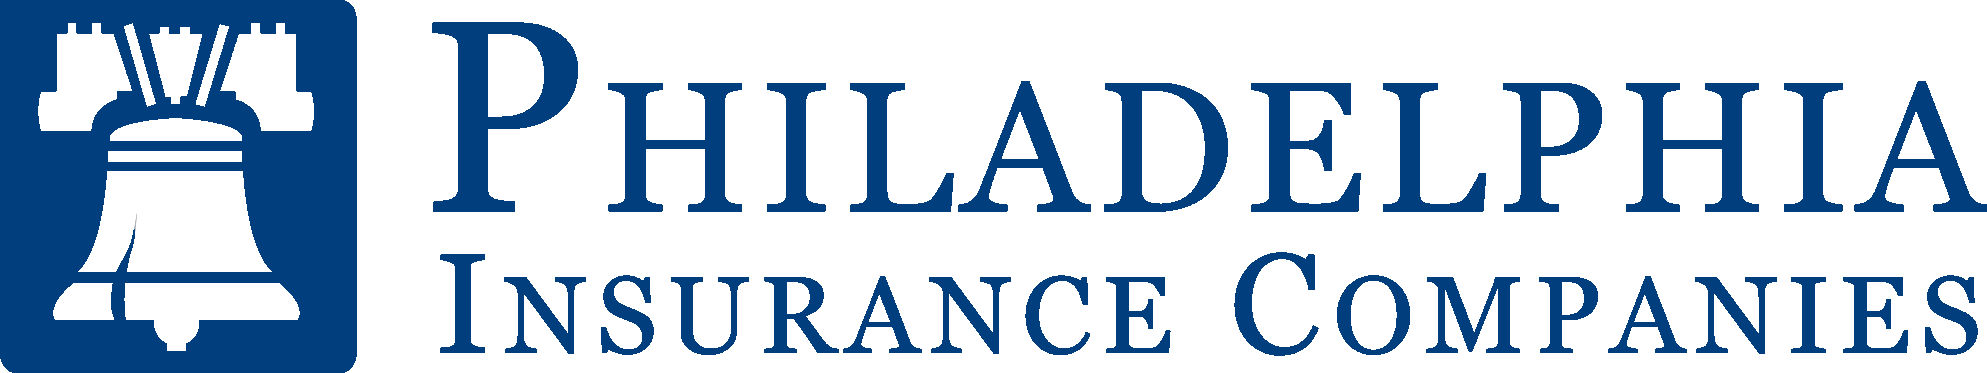 pic-logo-alt.png